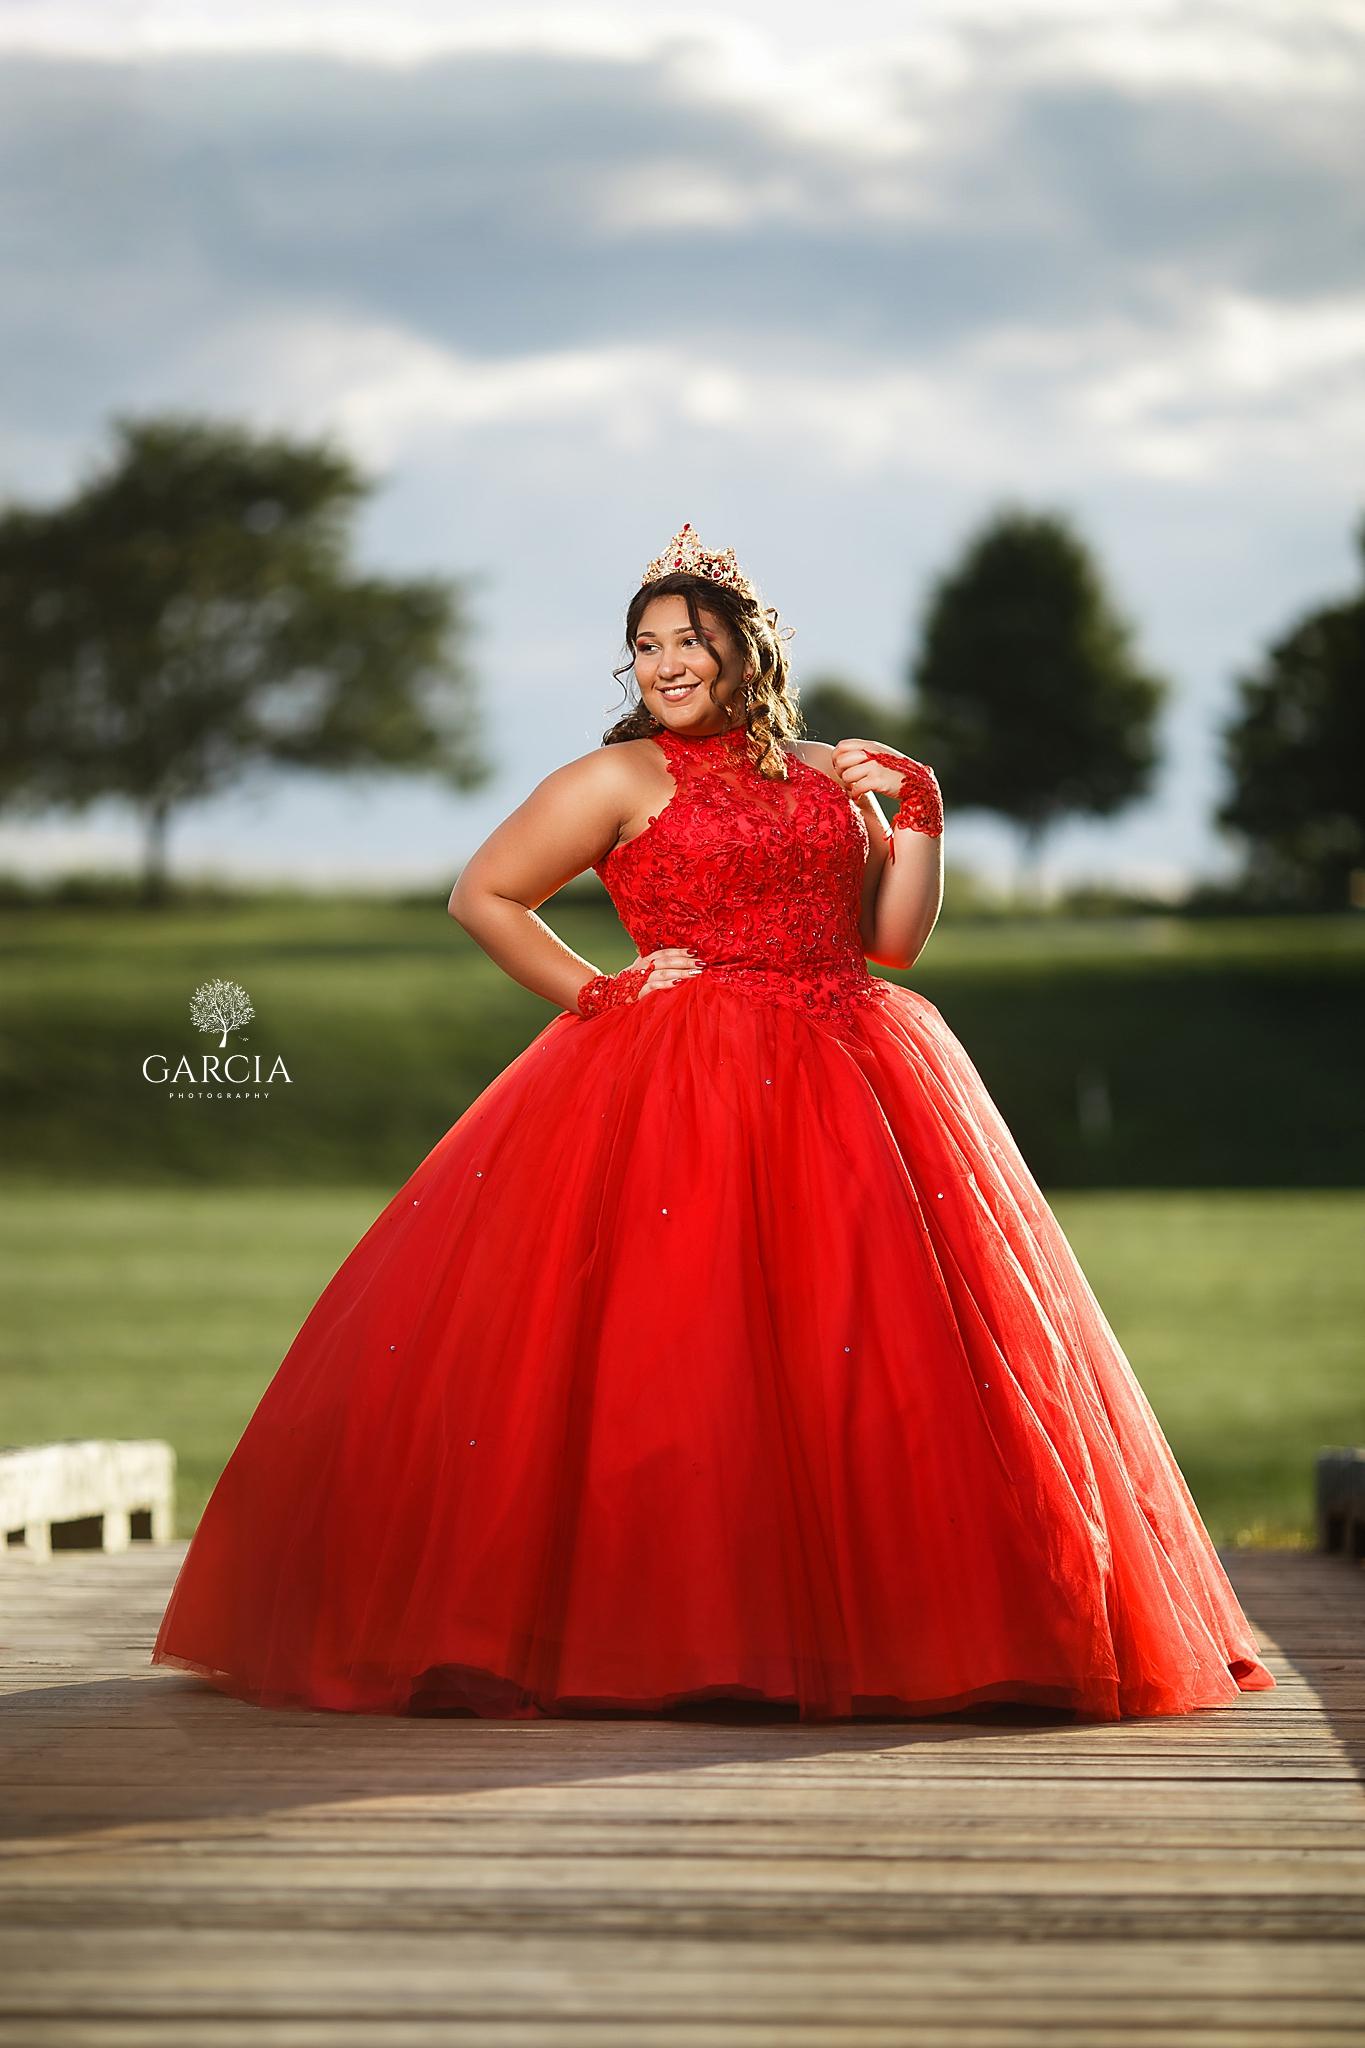 Anjali-Sweet-16-Garcia-Photography-8422.jpg